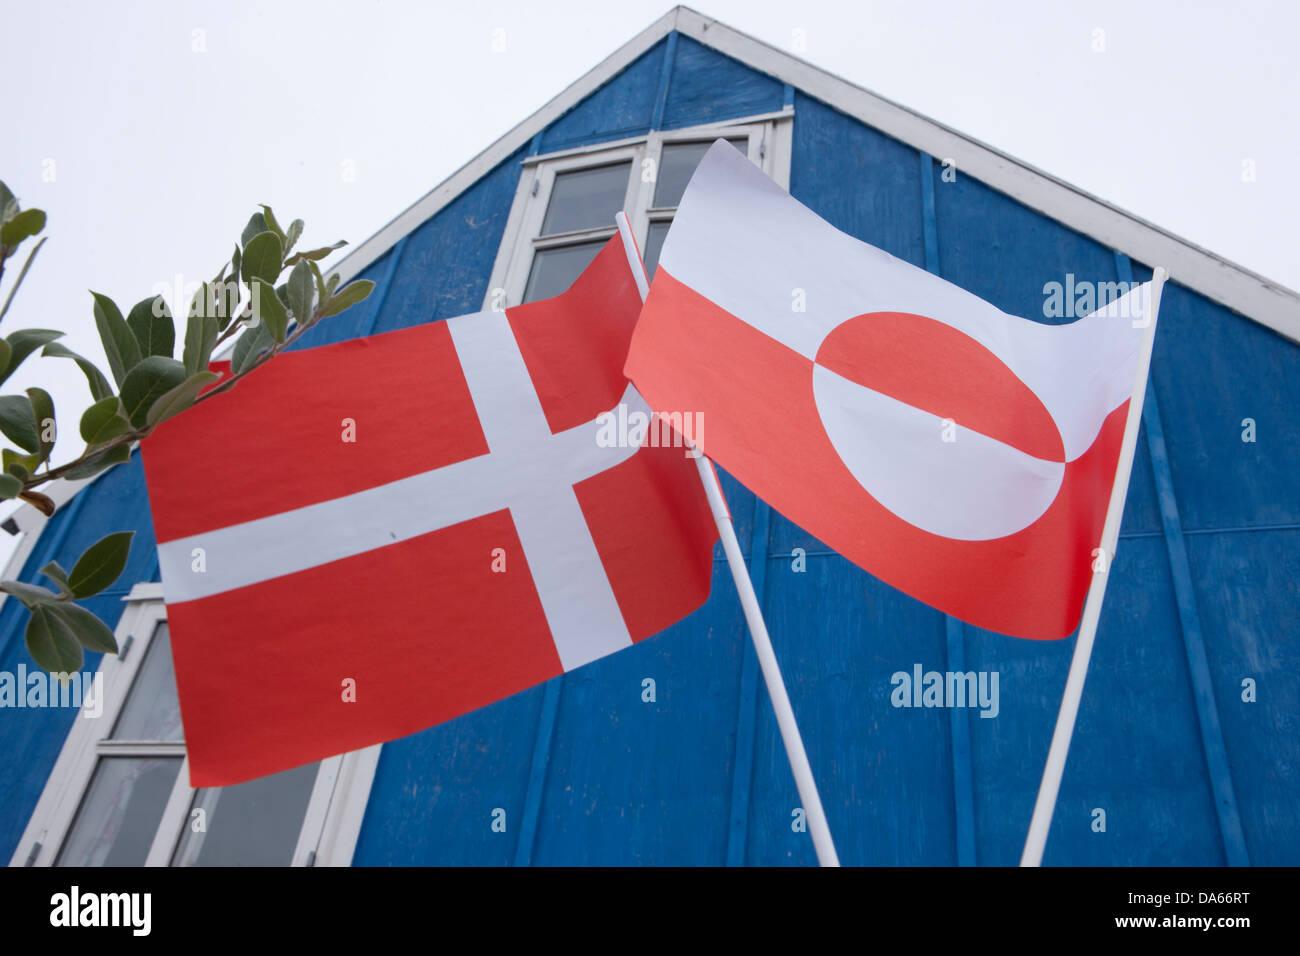 Danish, greenlandic, flags, banners, Greenland, East Greenland, flag, flags, Sermiligaaq, - Stock Image